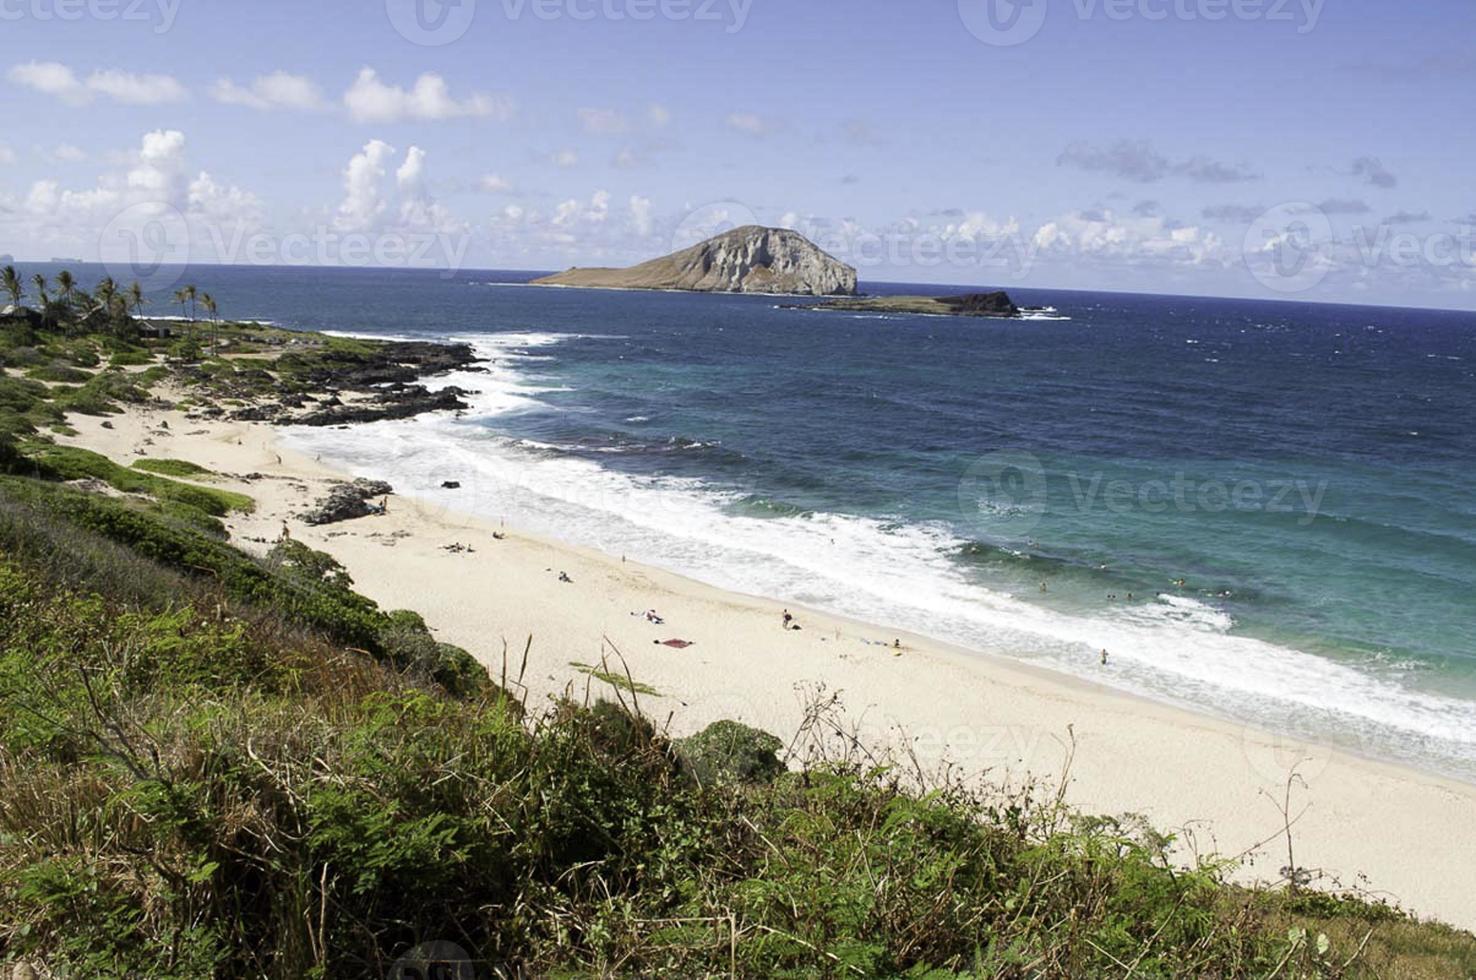 makapu'u beach vista på en solig veachdag. foto